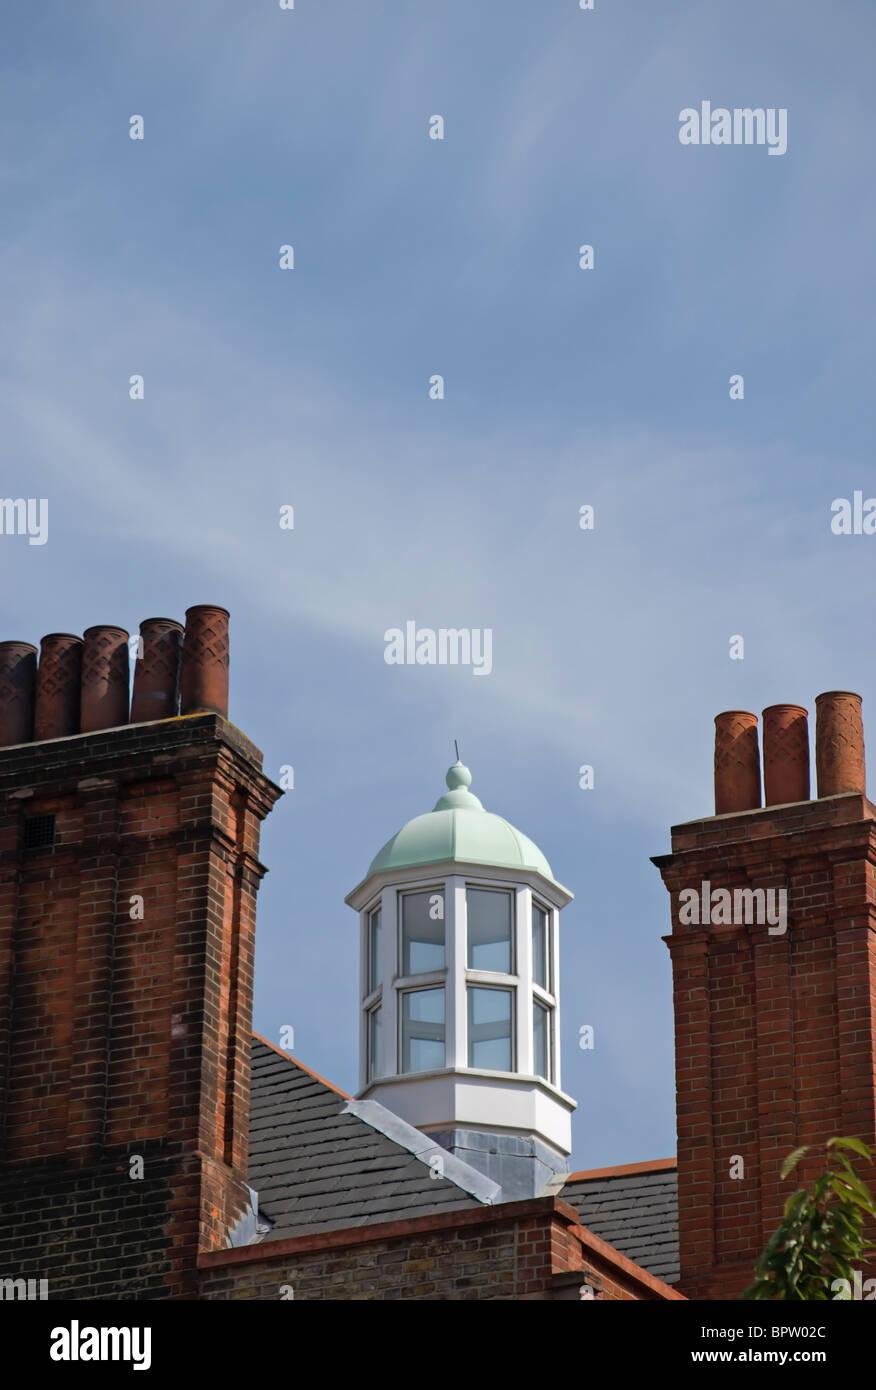 windowed cupola between tudor style redbrick chimneys on a  rooftop in cheyne walk, chelsea, london, england - Stock Image